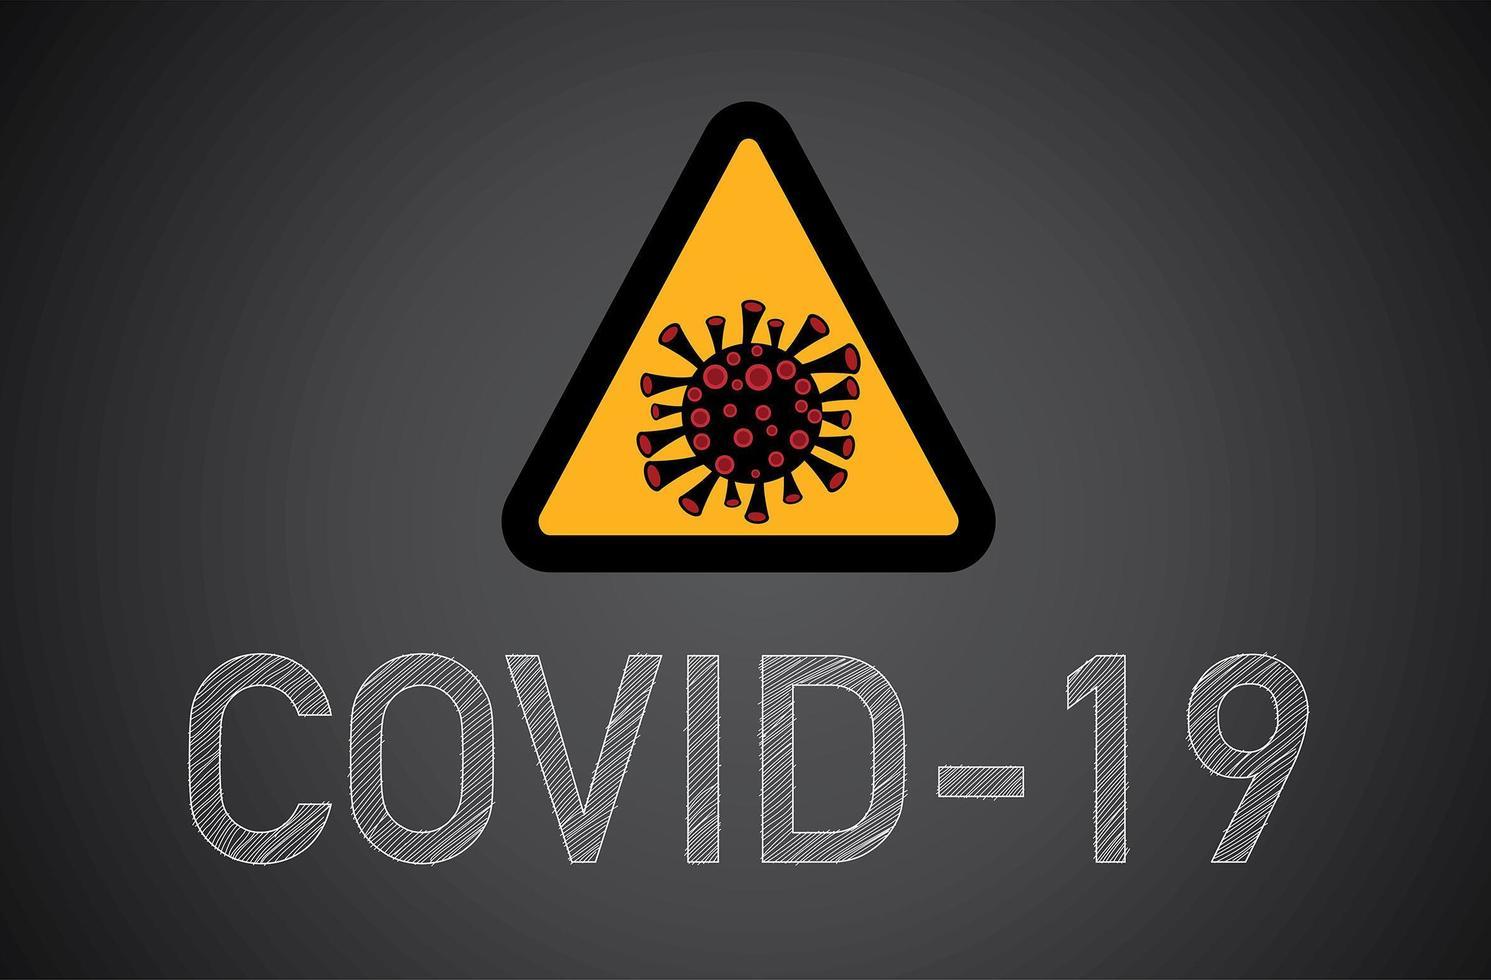 covid-19, coronavirus tecken. vektor